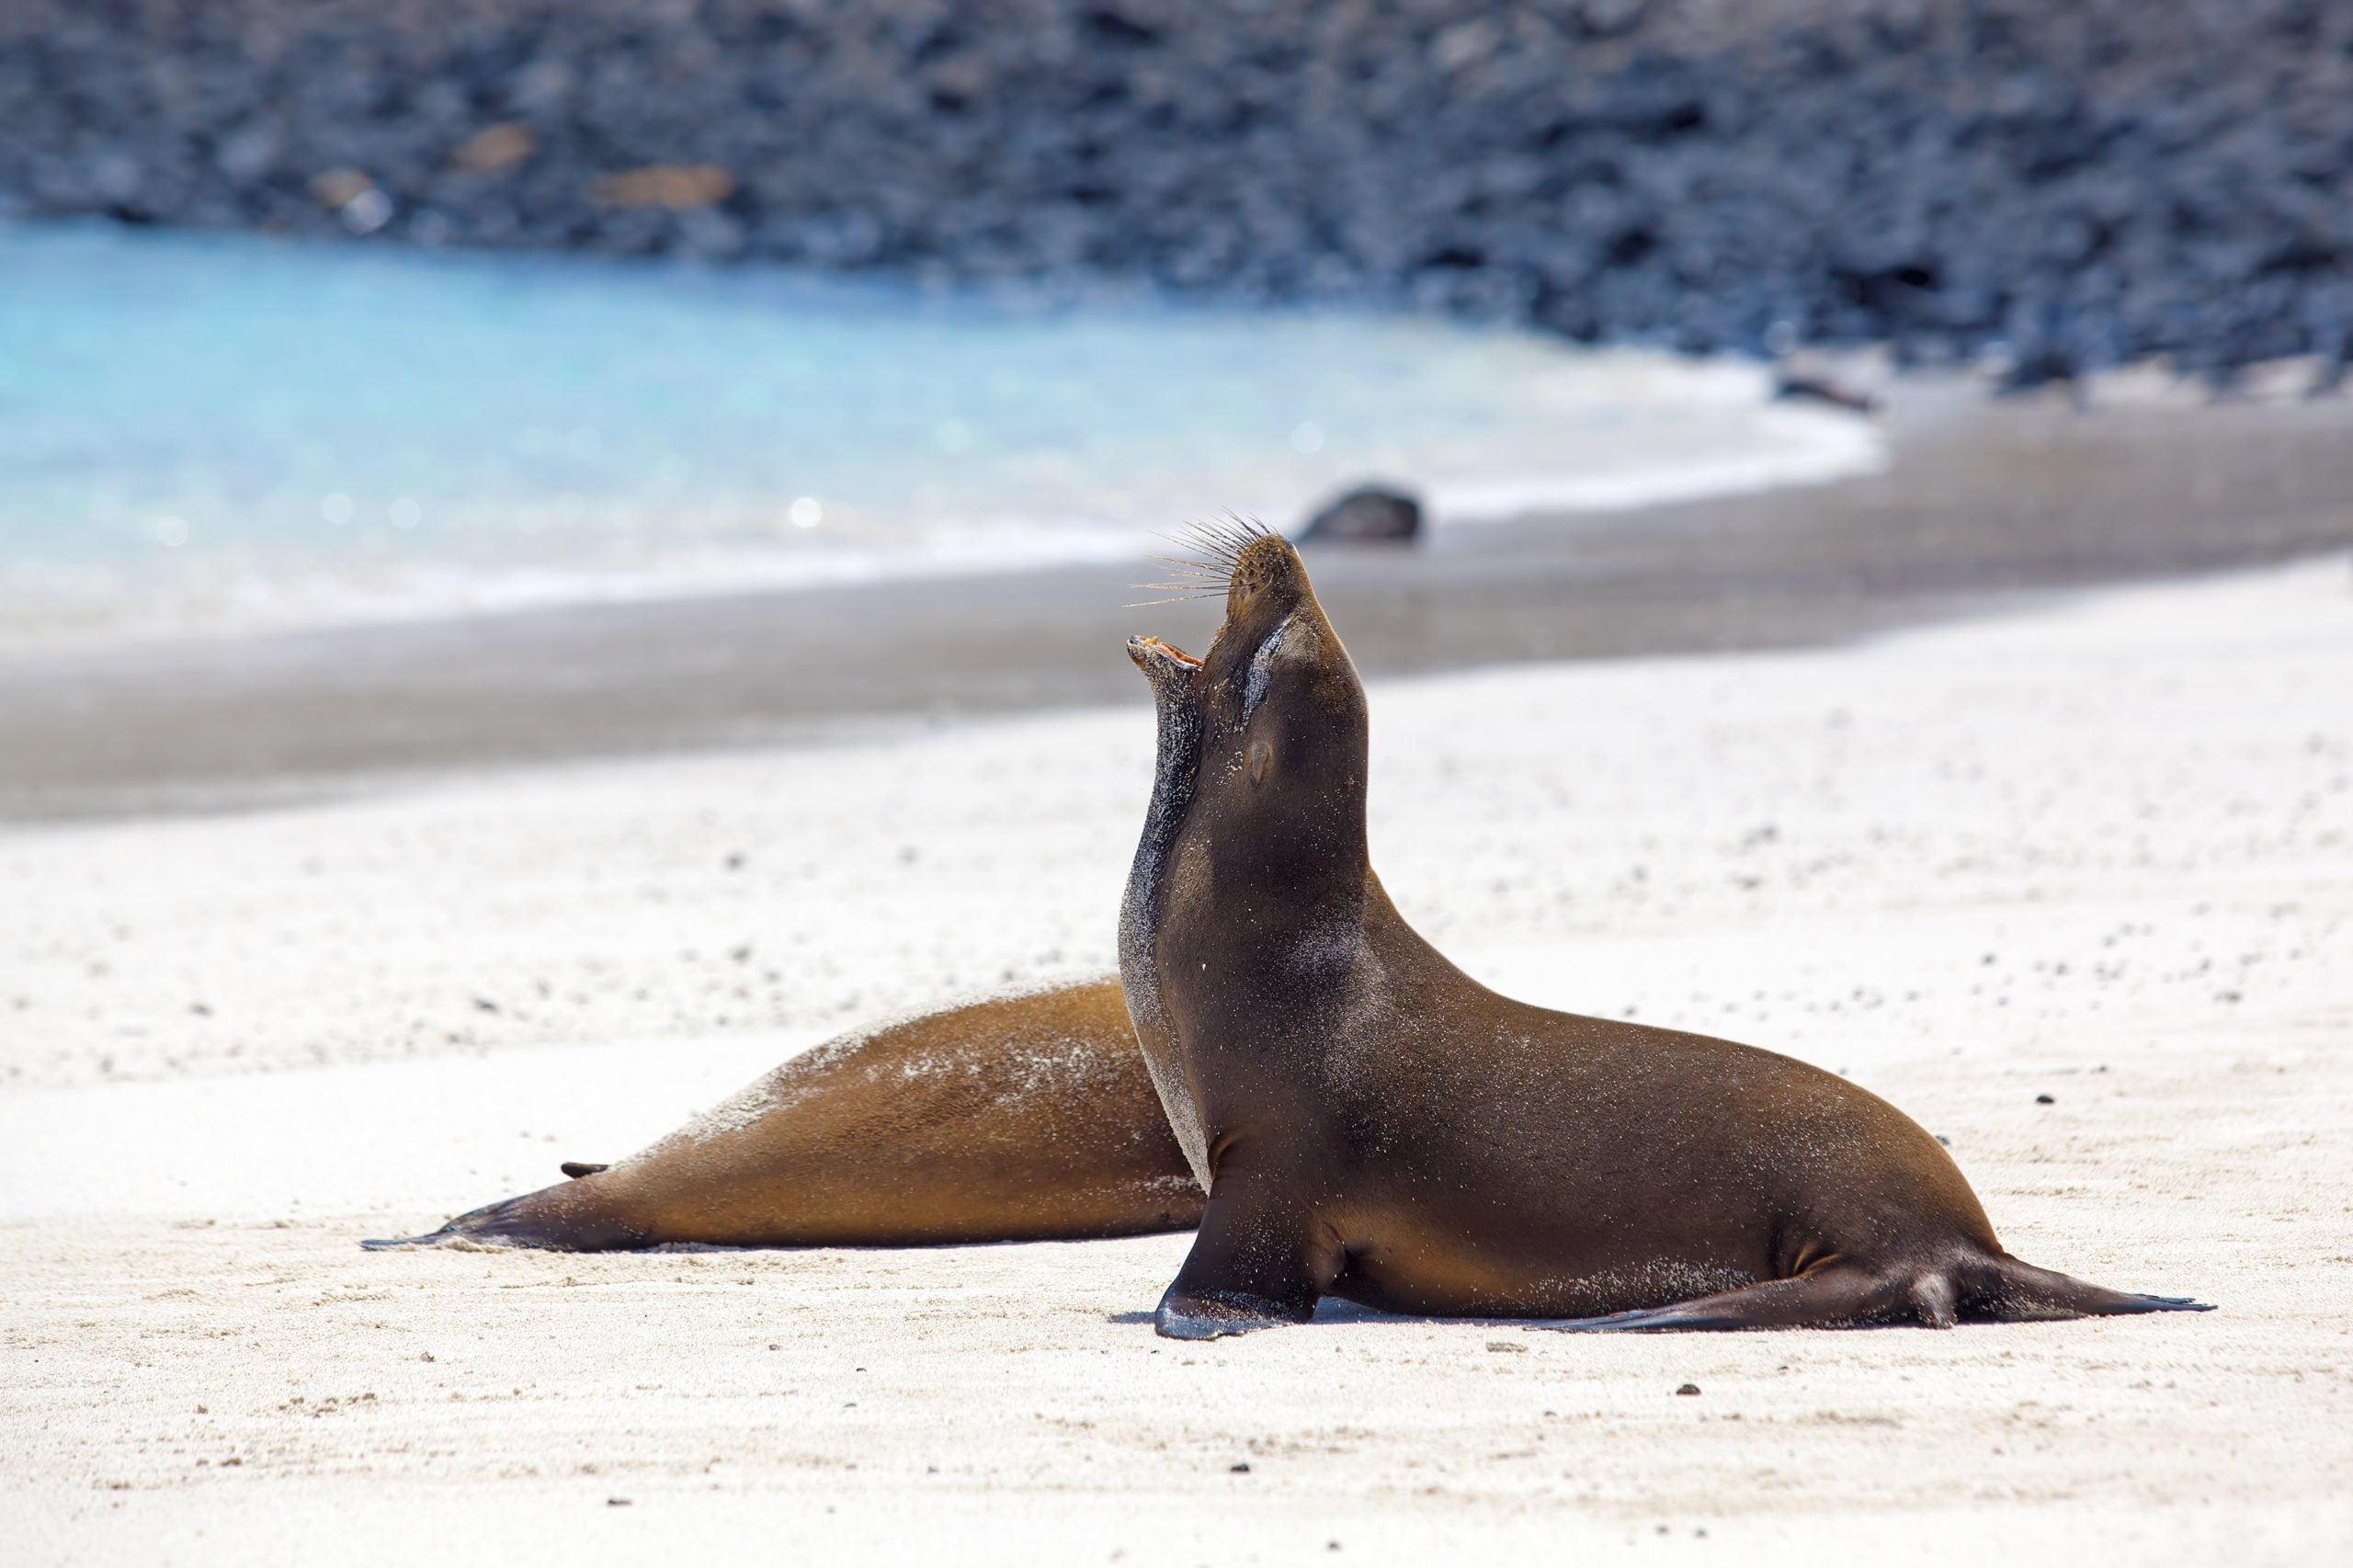 Galapagos by land